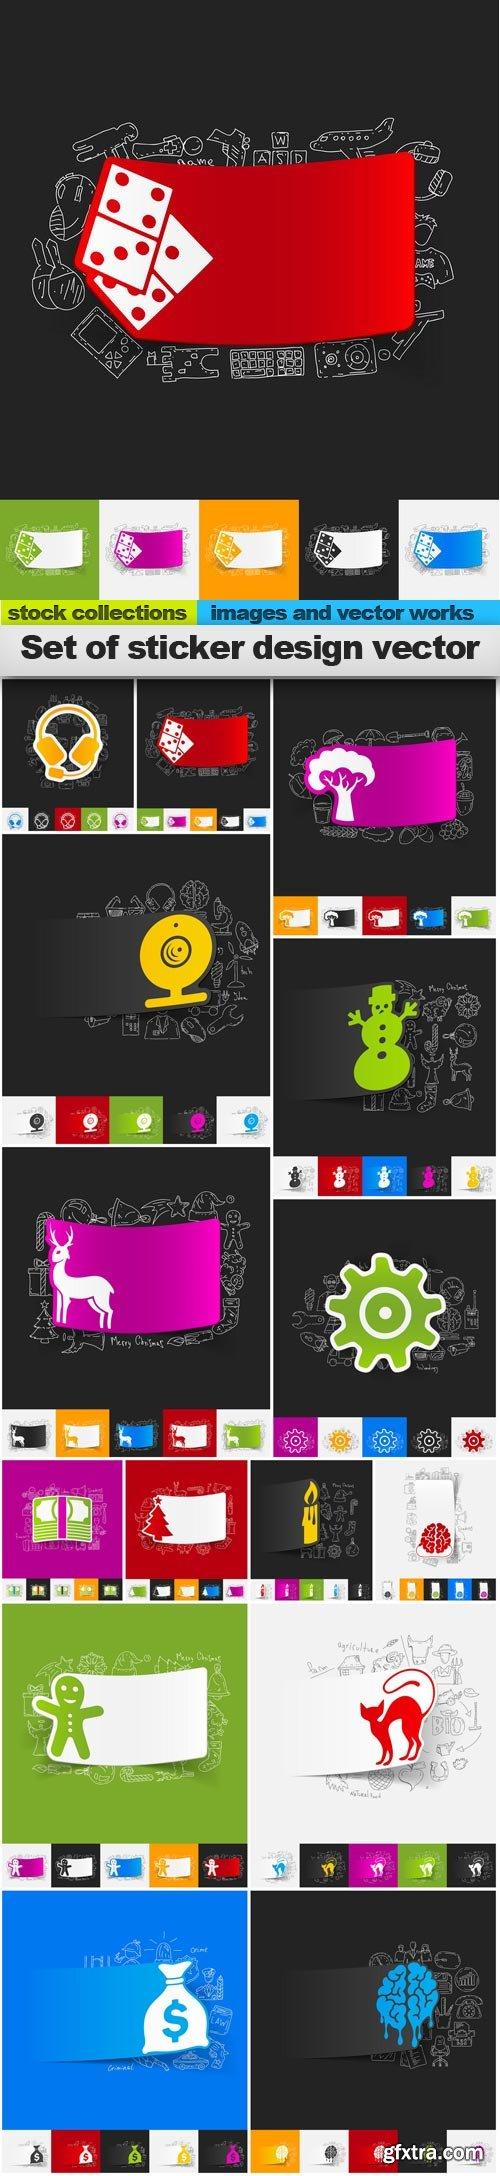 Set of sticker design vector, 15 x EPS